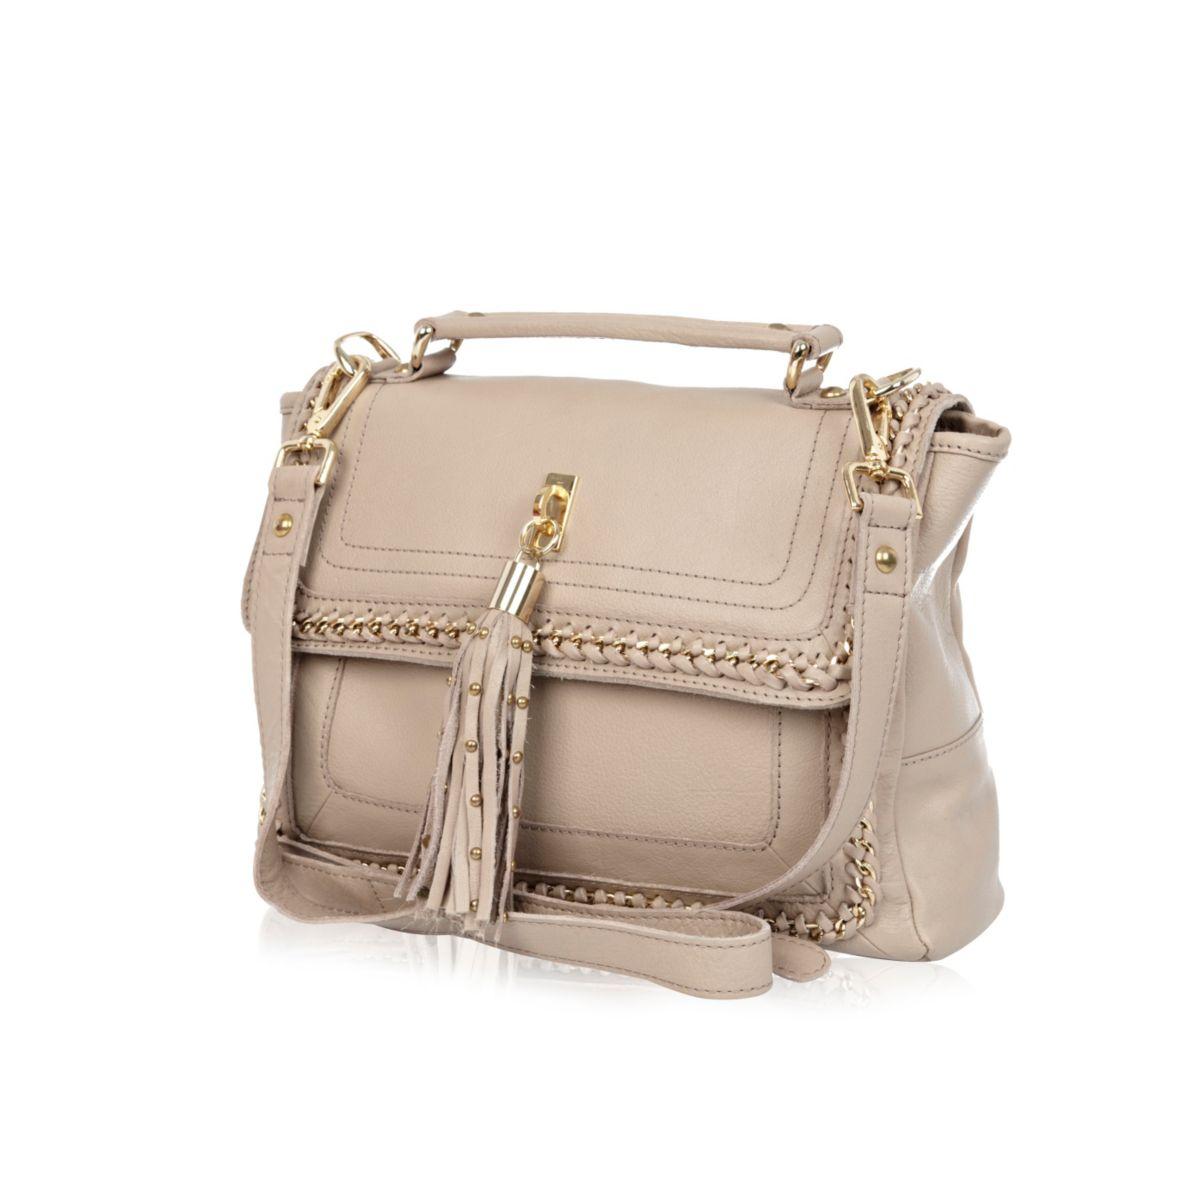 Beige leather chain detail satchel